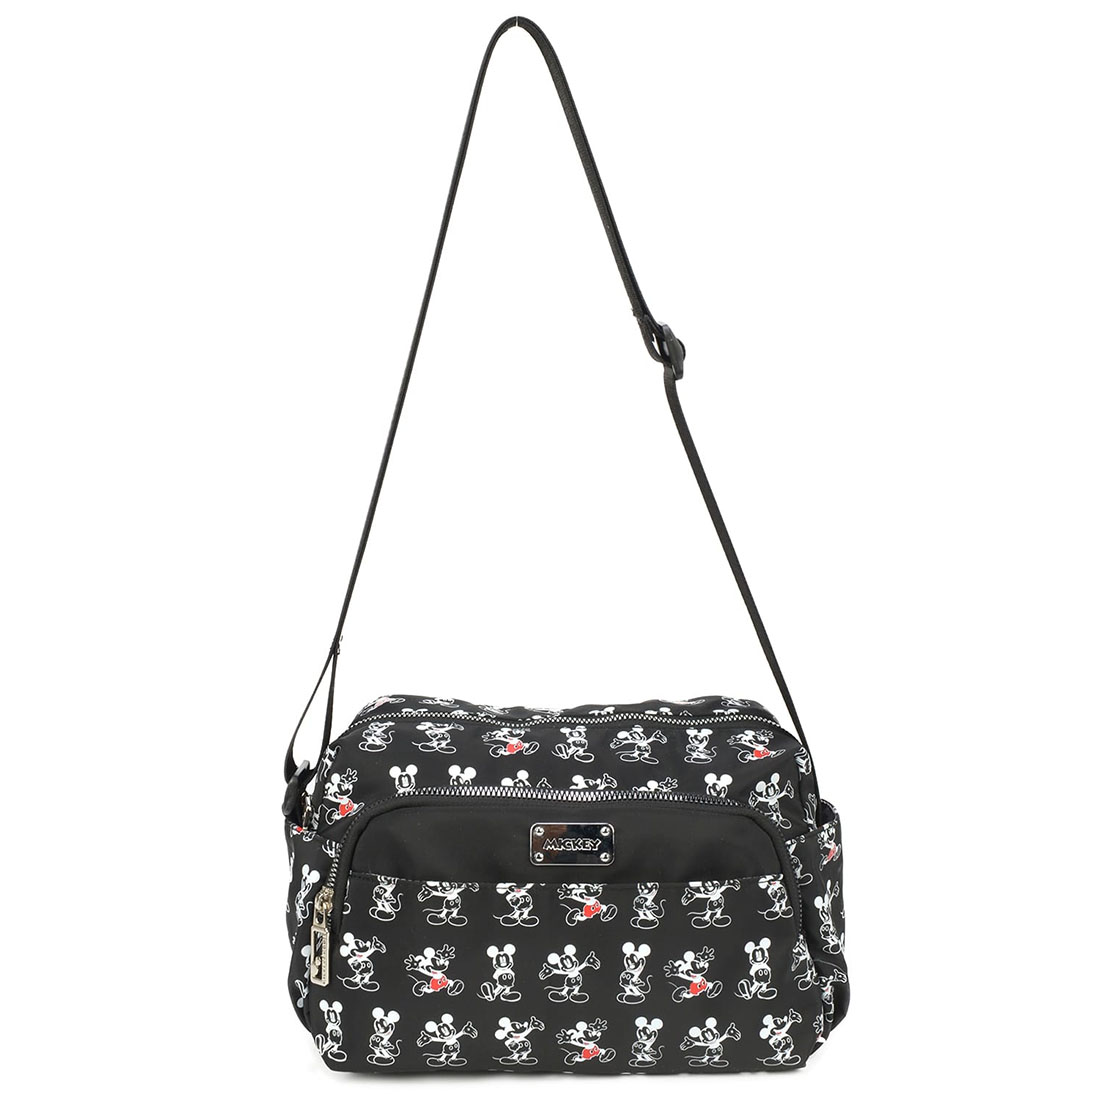 Bolsa Feminina Transversal Mickey BMK78481